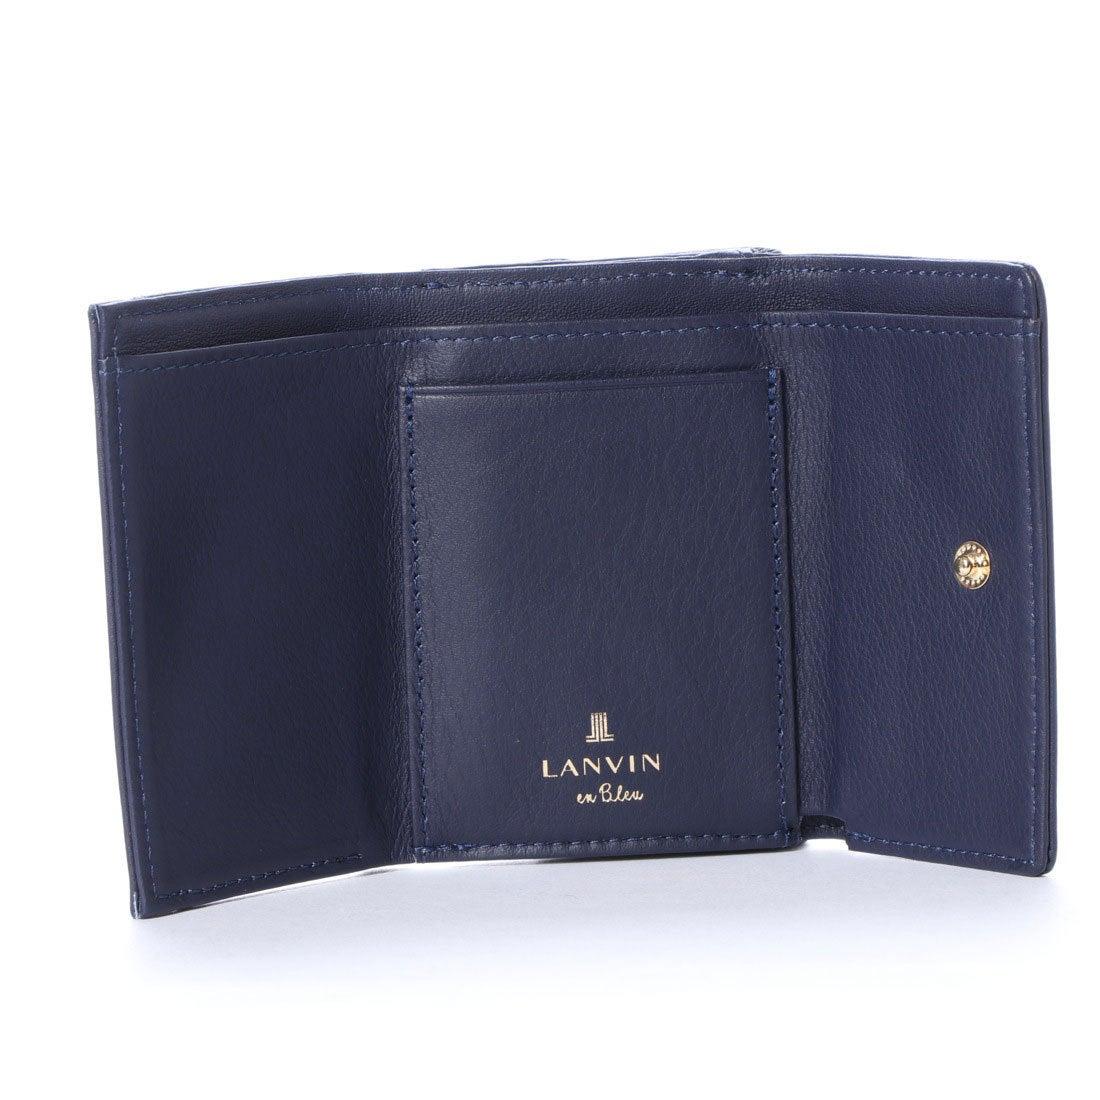 1691d2741806 ランバン オン ブルー LANVIN en Bleu シャペル 3つ折りミニ財布 ...